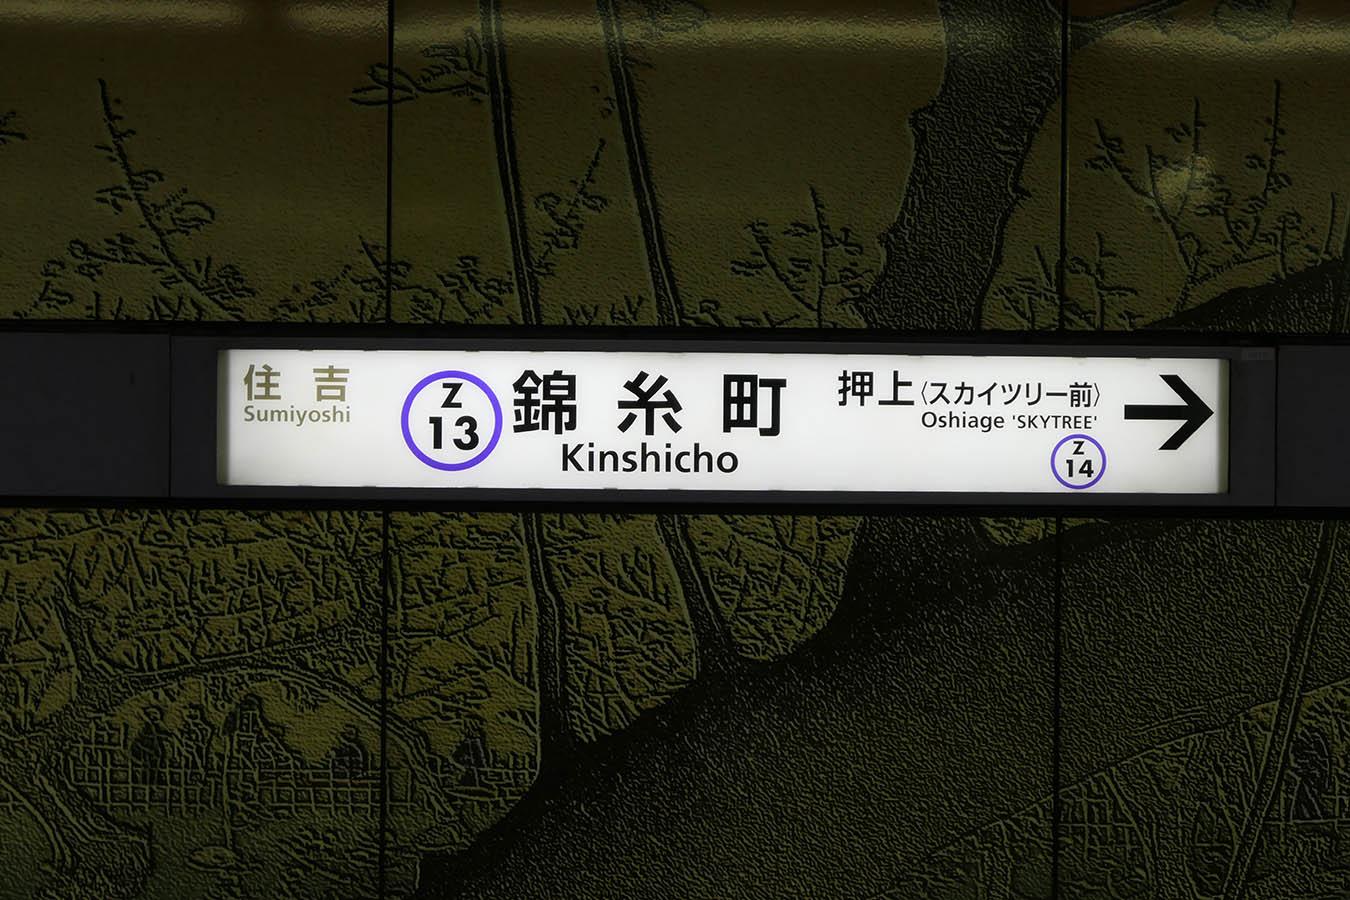 z13_photo03.jpg